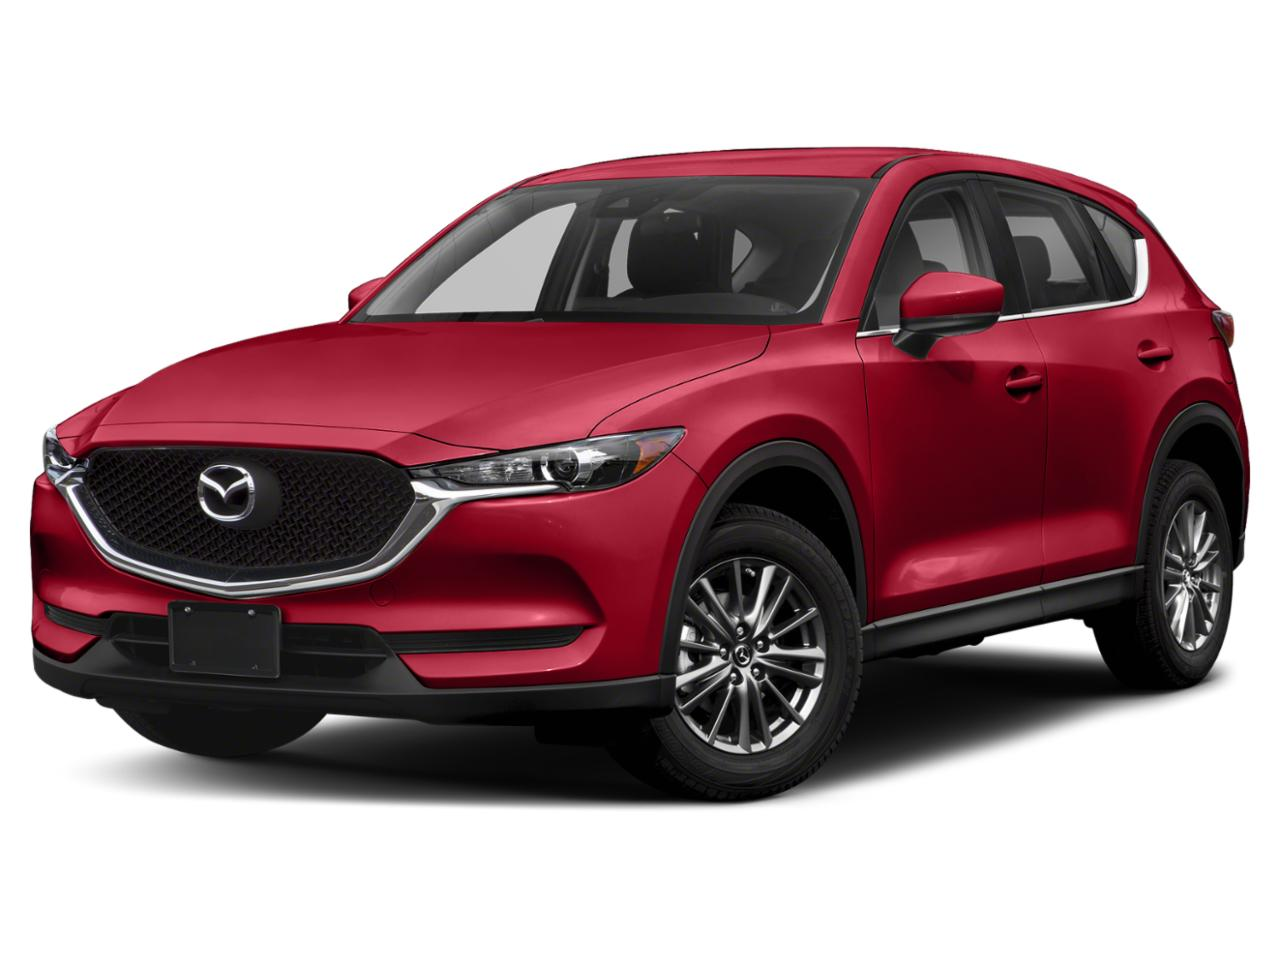 2019 Mazda CX-5 Vehicle Photo in Plainfield, IL 60586